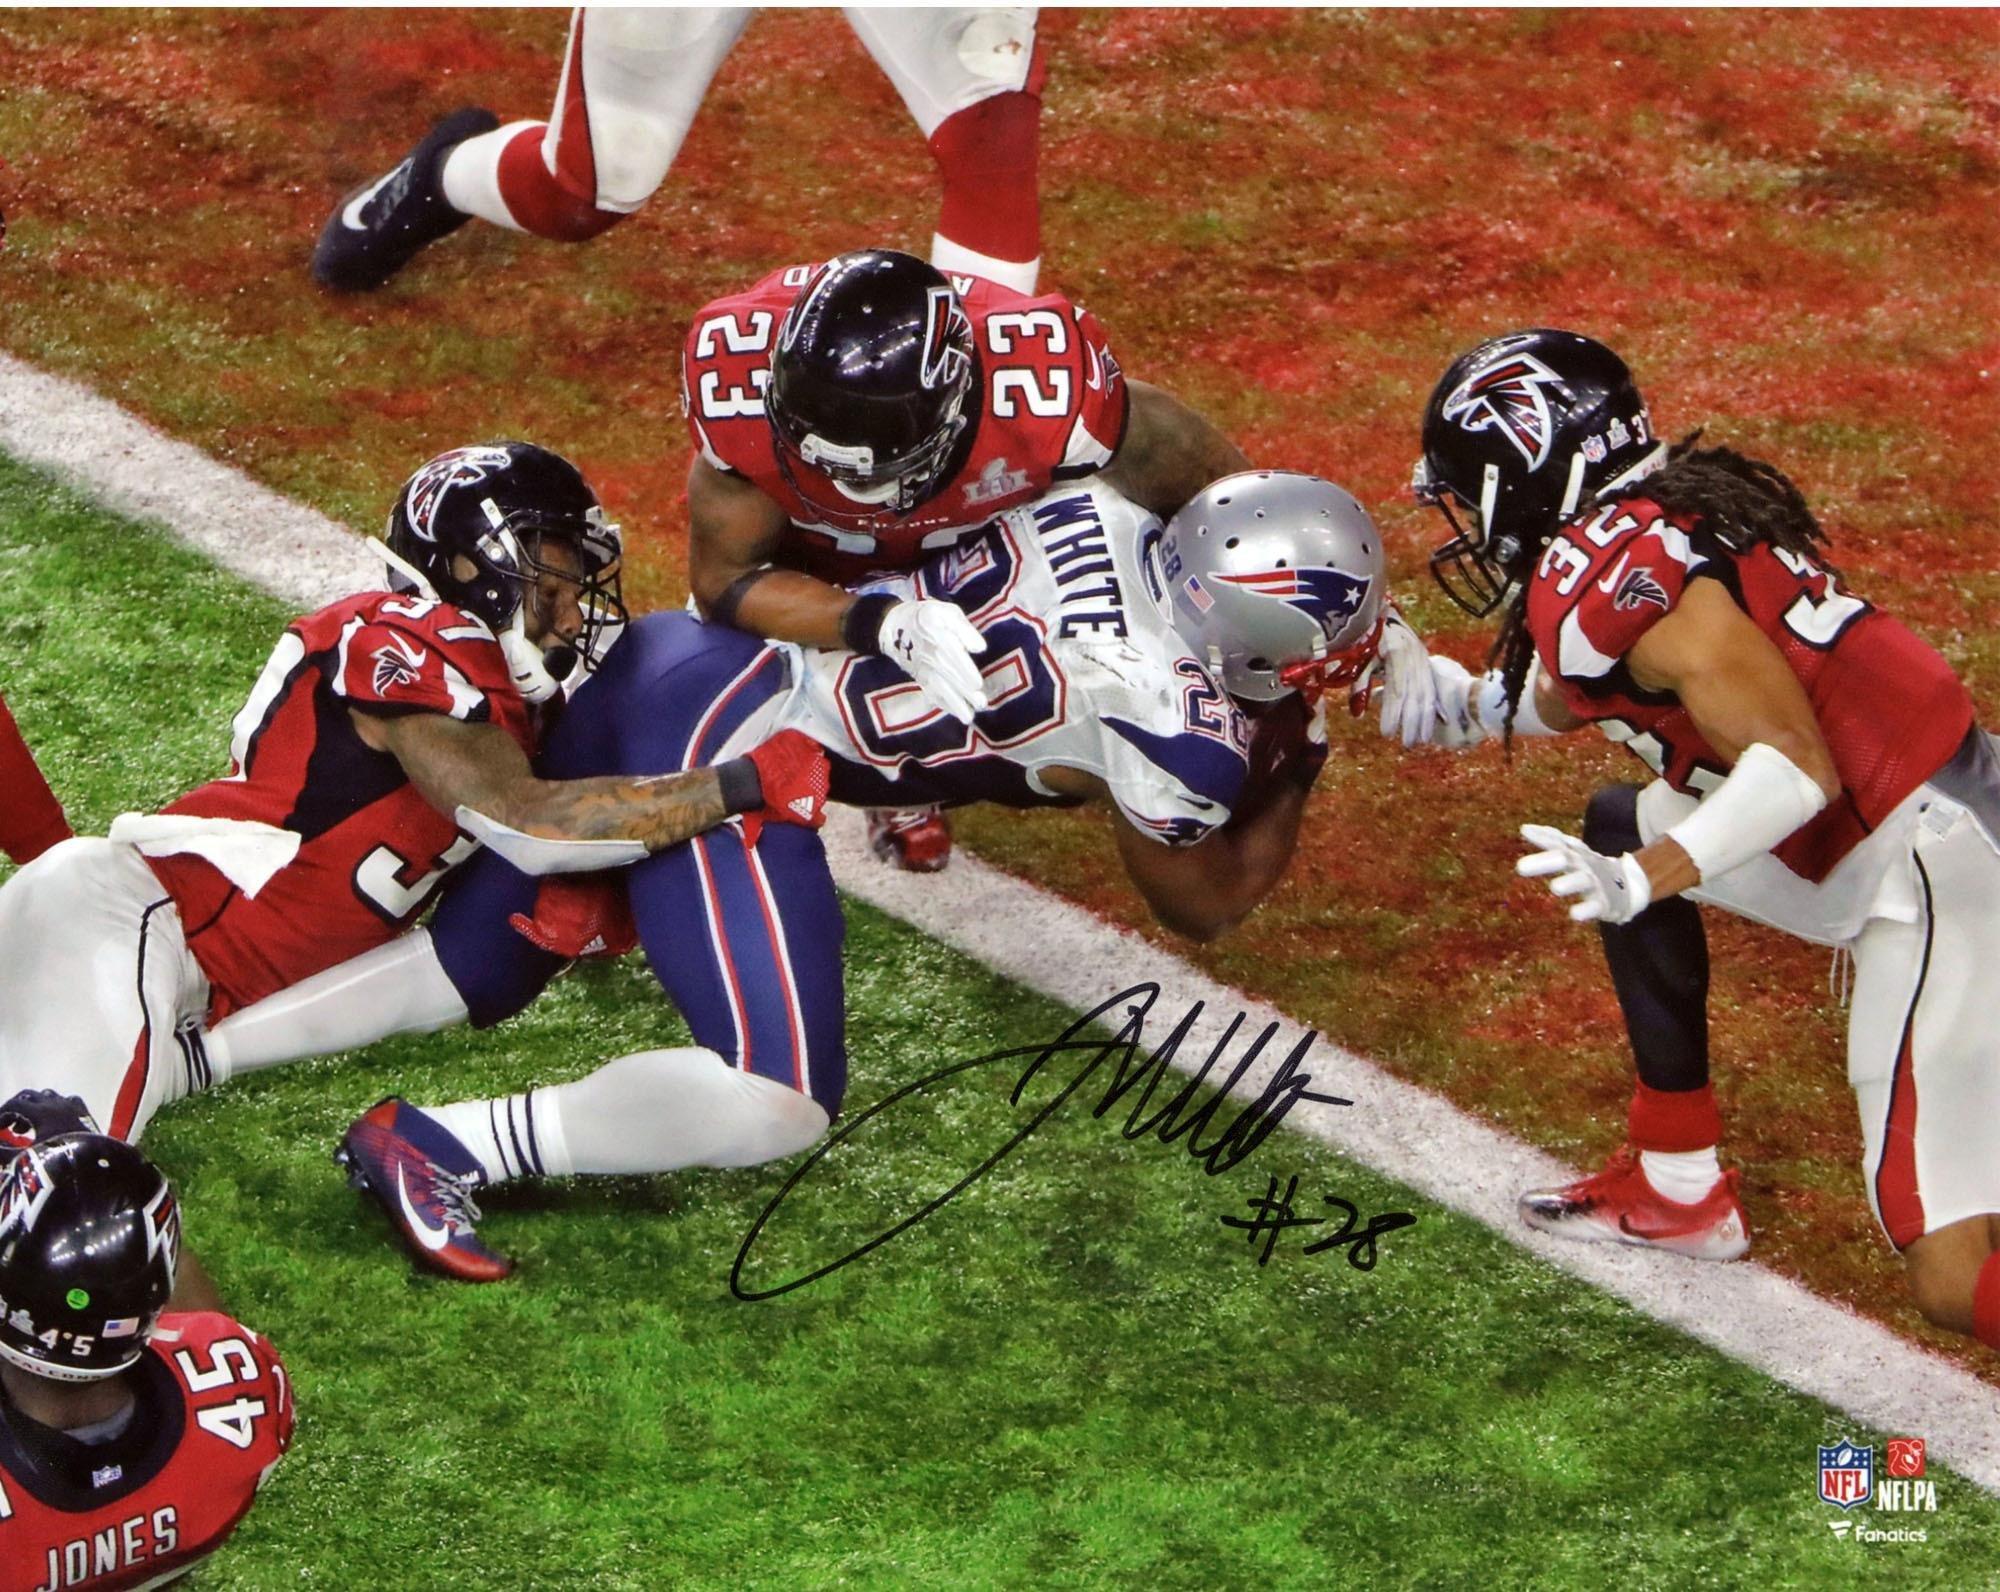 "James White New England Patriots Autographed 8"" x 10"" Super Bowl LI Champions Game Winning Touchdown Photograph Fanatics Authentic Certified"